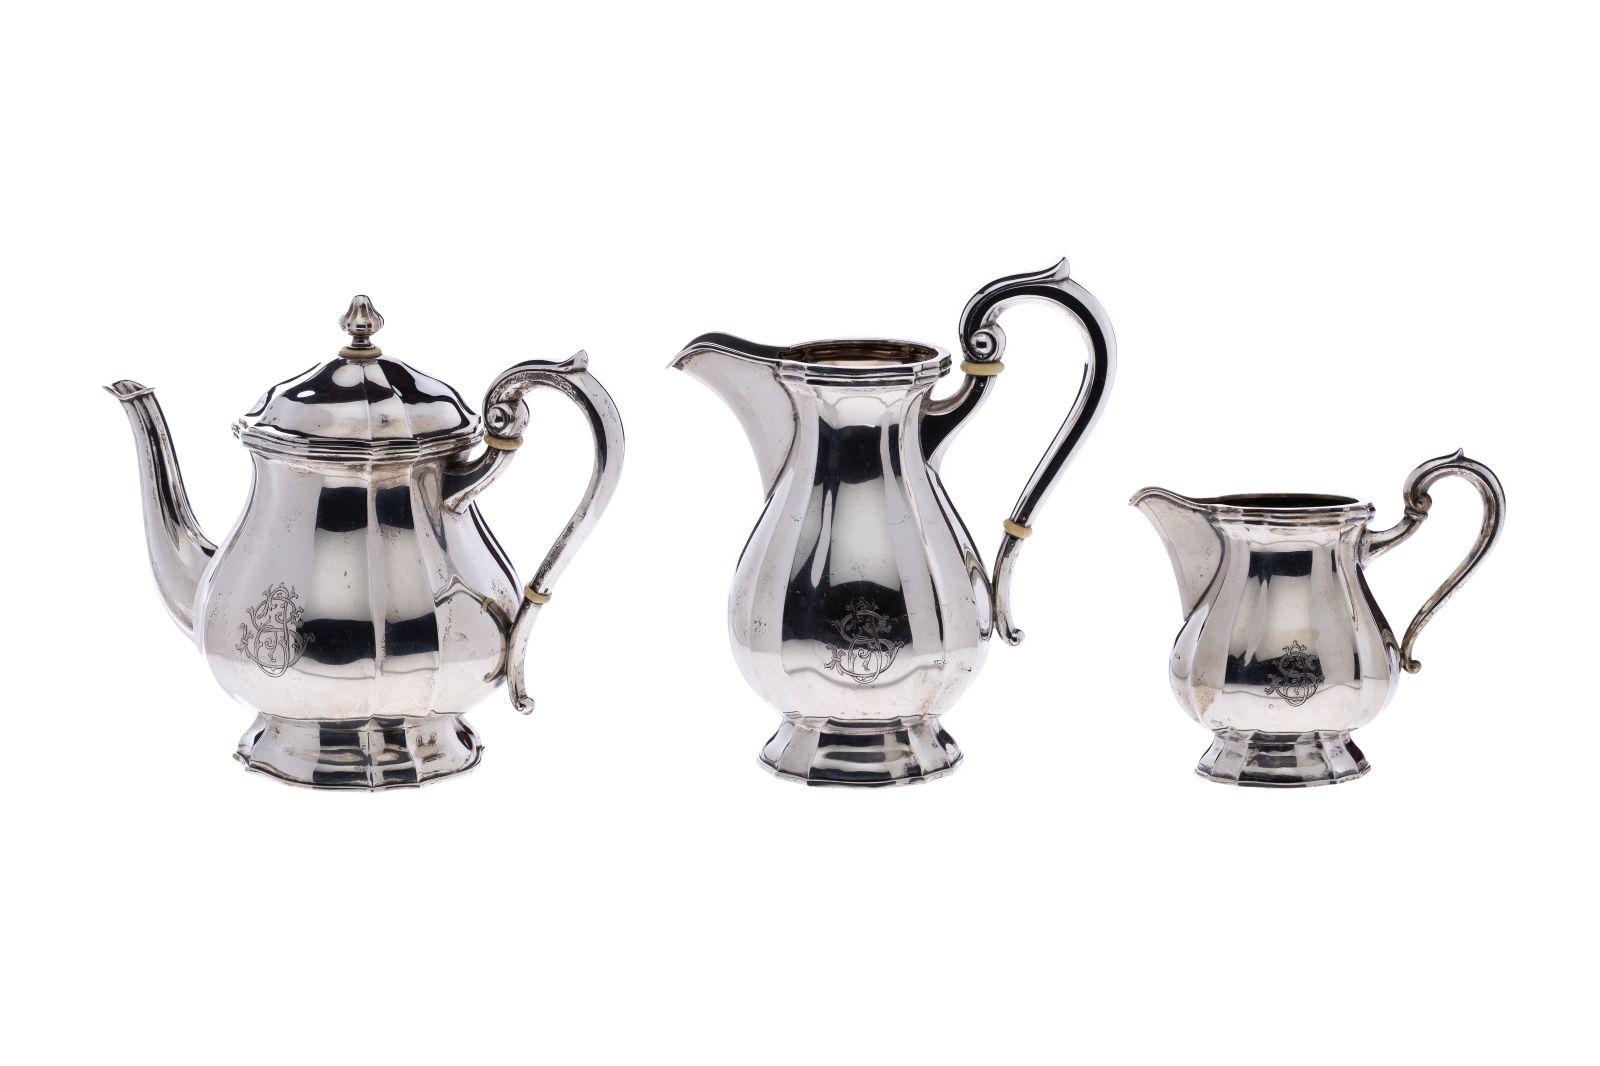 #59 Teapot, large milk jug, small milk jug | Teekanne, große Milchkanne, kleine Milchkanne Image